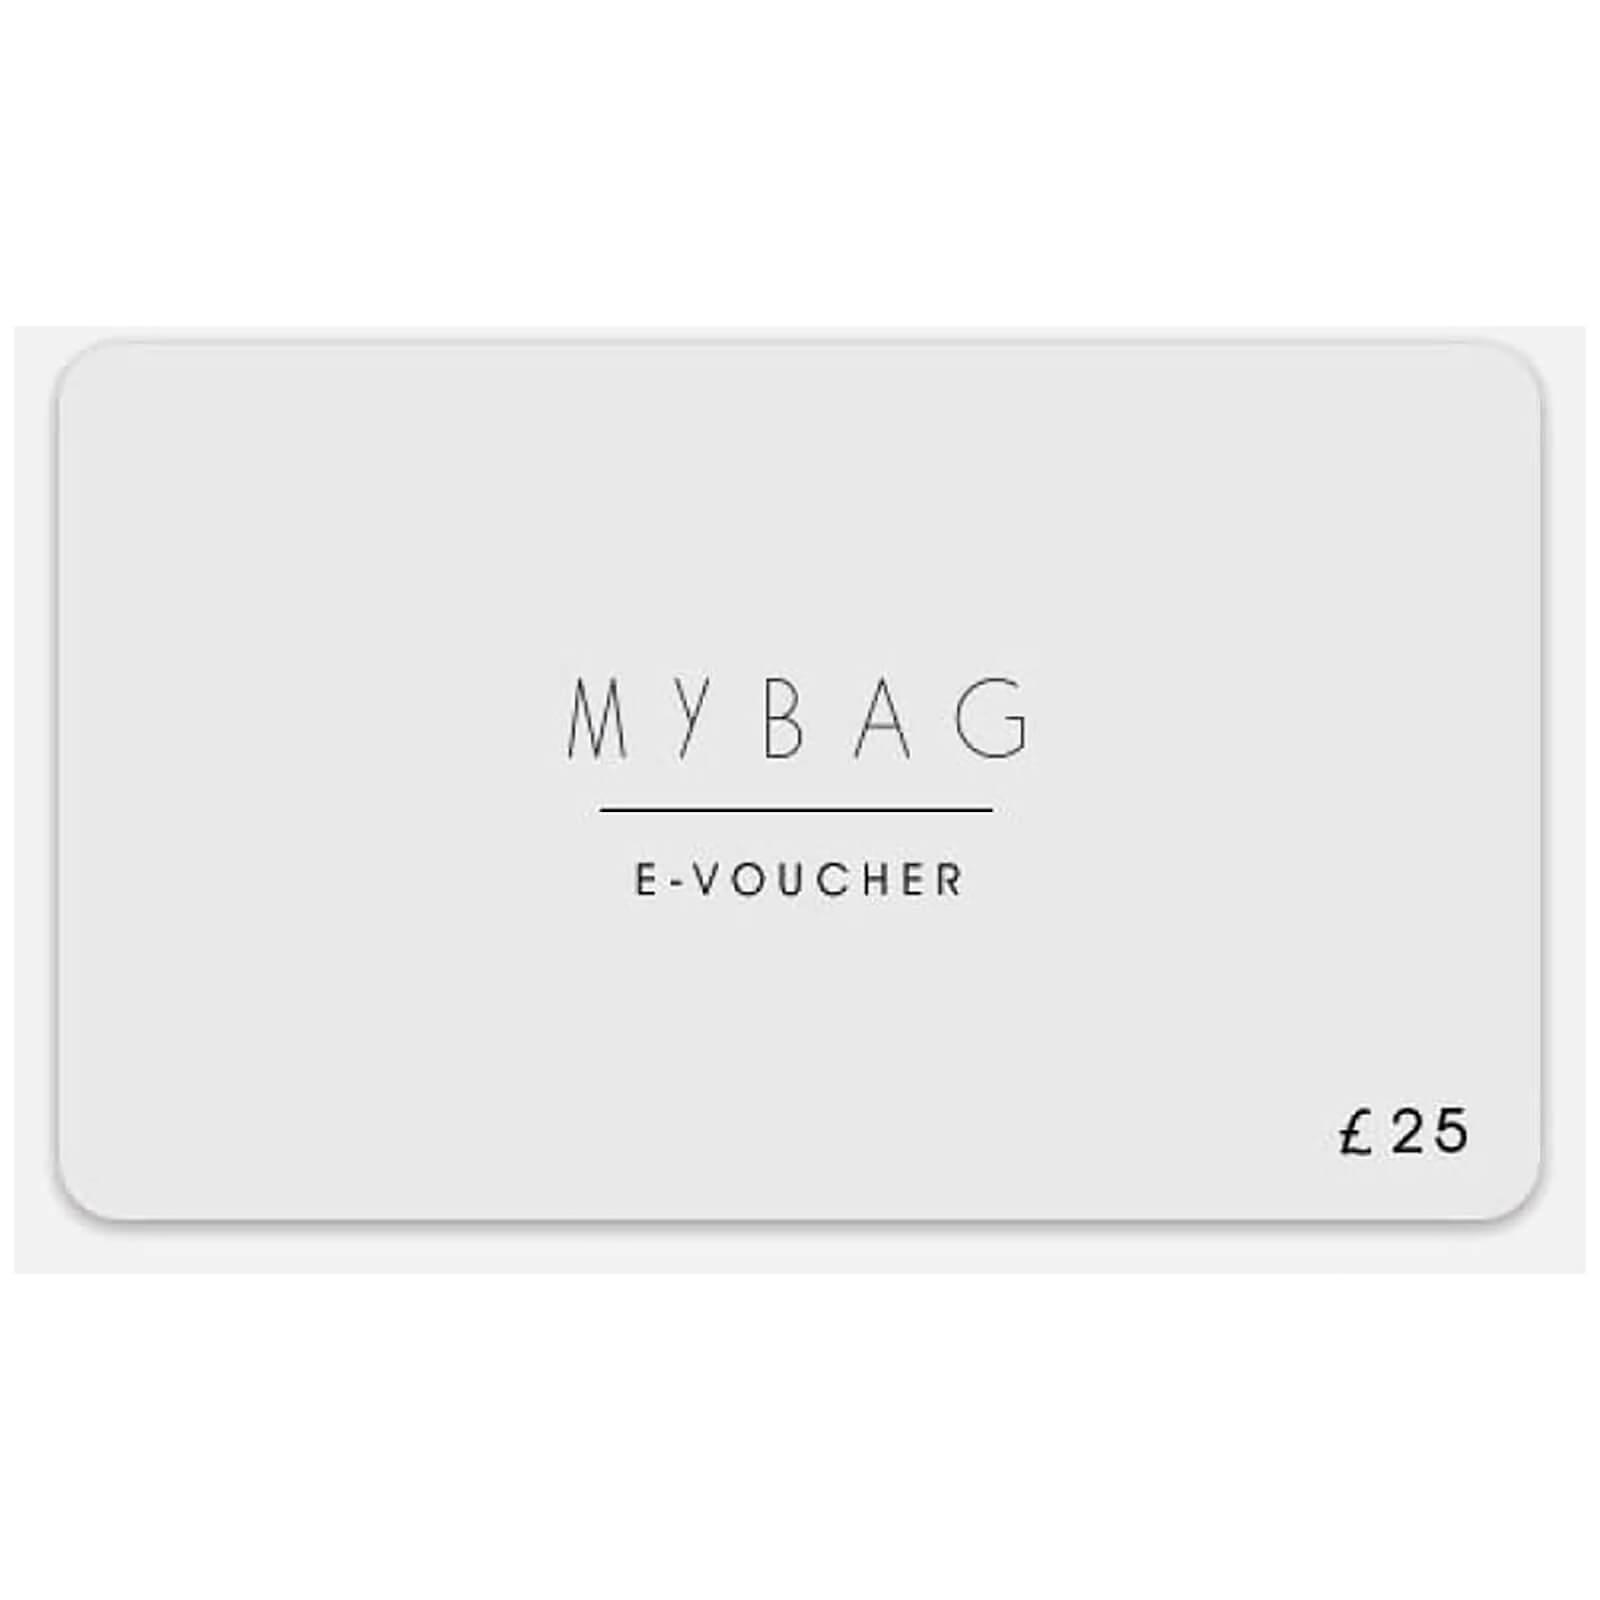 £25 MyBag Gift Voucher